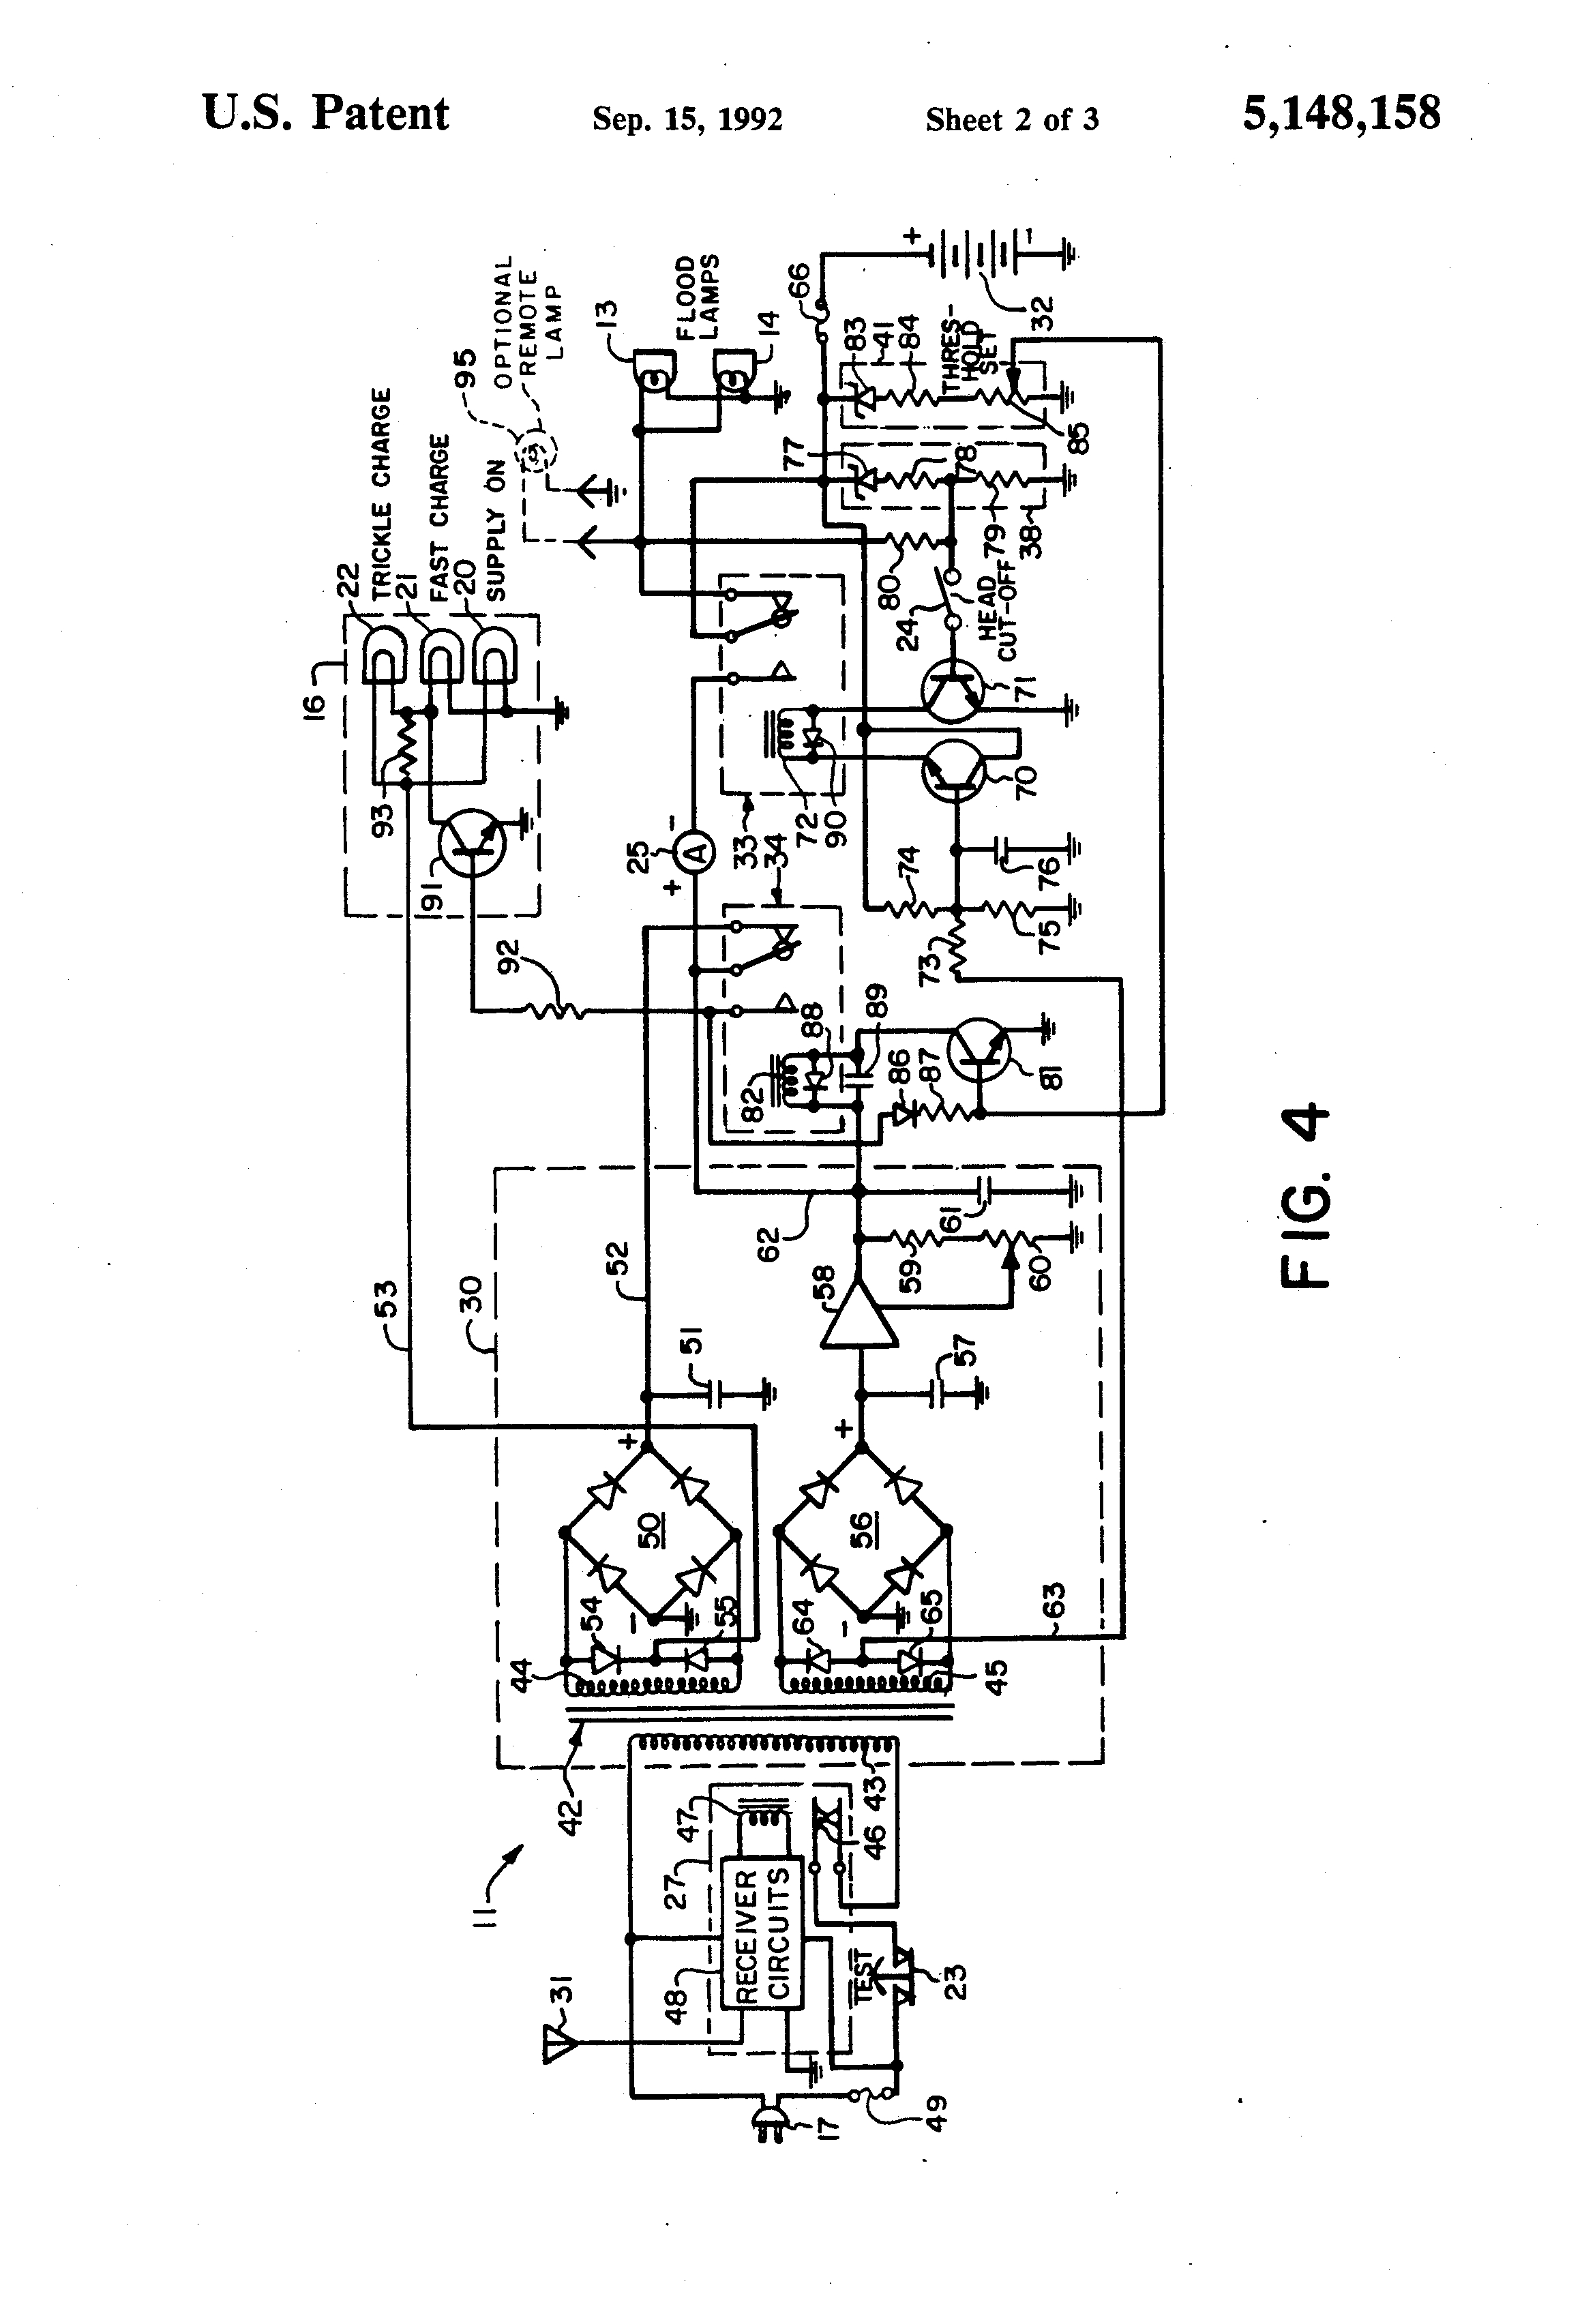 iota i32 emergency ballast wiring diagram 2001 ford windstar serpentine belt i320 collection